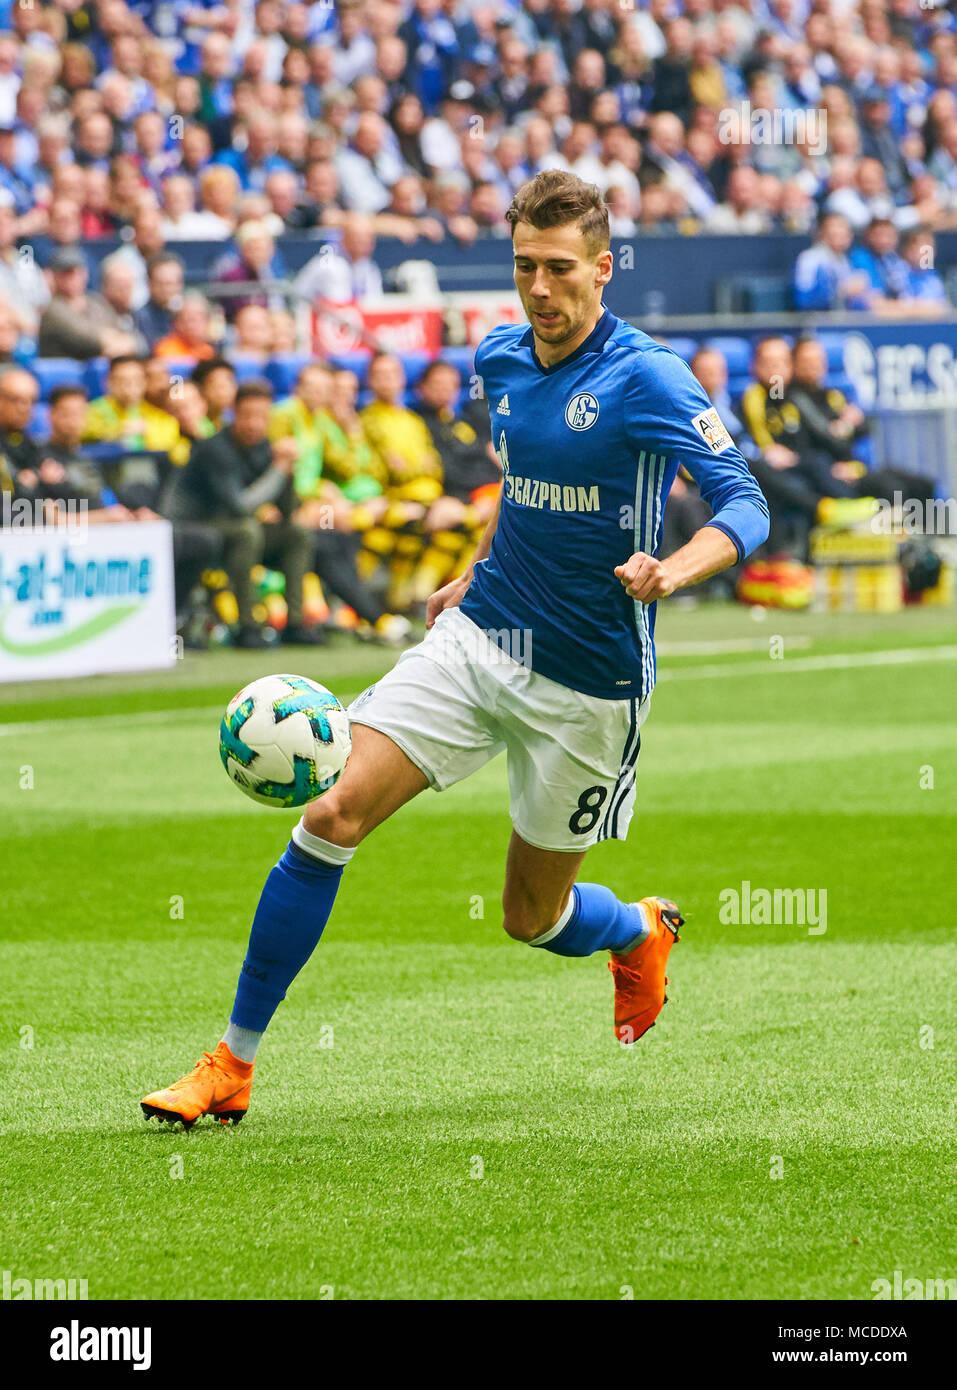 Gelsenkirchen, Germany. 15th April 2018. FC Schalke-BVB Soccer, Gelsenkirchen, April 15, 2018 Leon GORETZKA, S04 8  drives the ball, action, full-size,    FC SCHALKE 04 -  BORUSSIA DORTMUND 2-0 1.Division, German Football League, Gelsenkirchen, April 15, 2018,  Season 2017/2018 © Peter Schatz / Alamy Live News - Stock Image